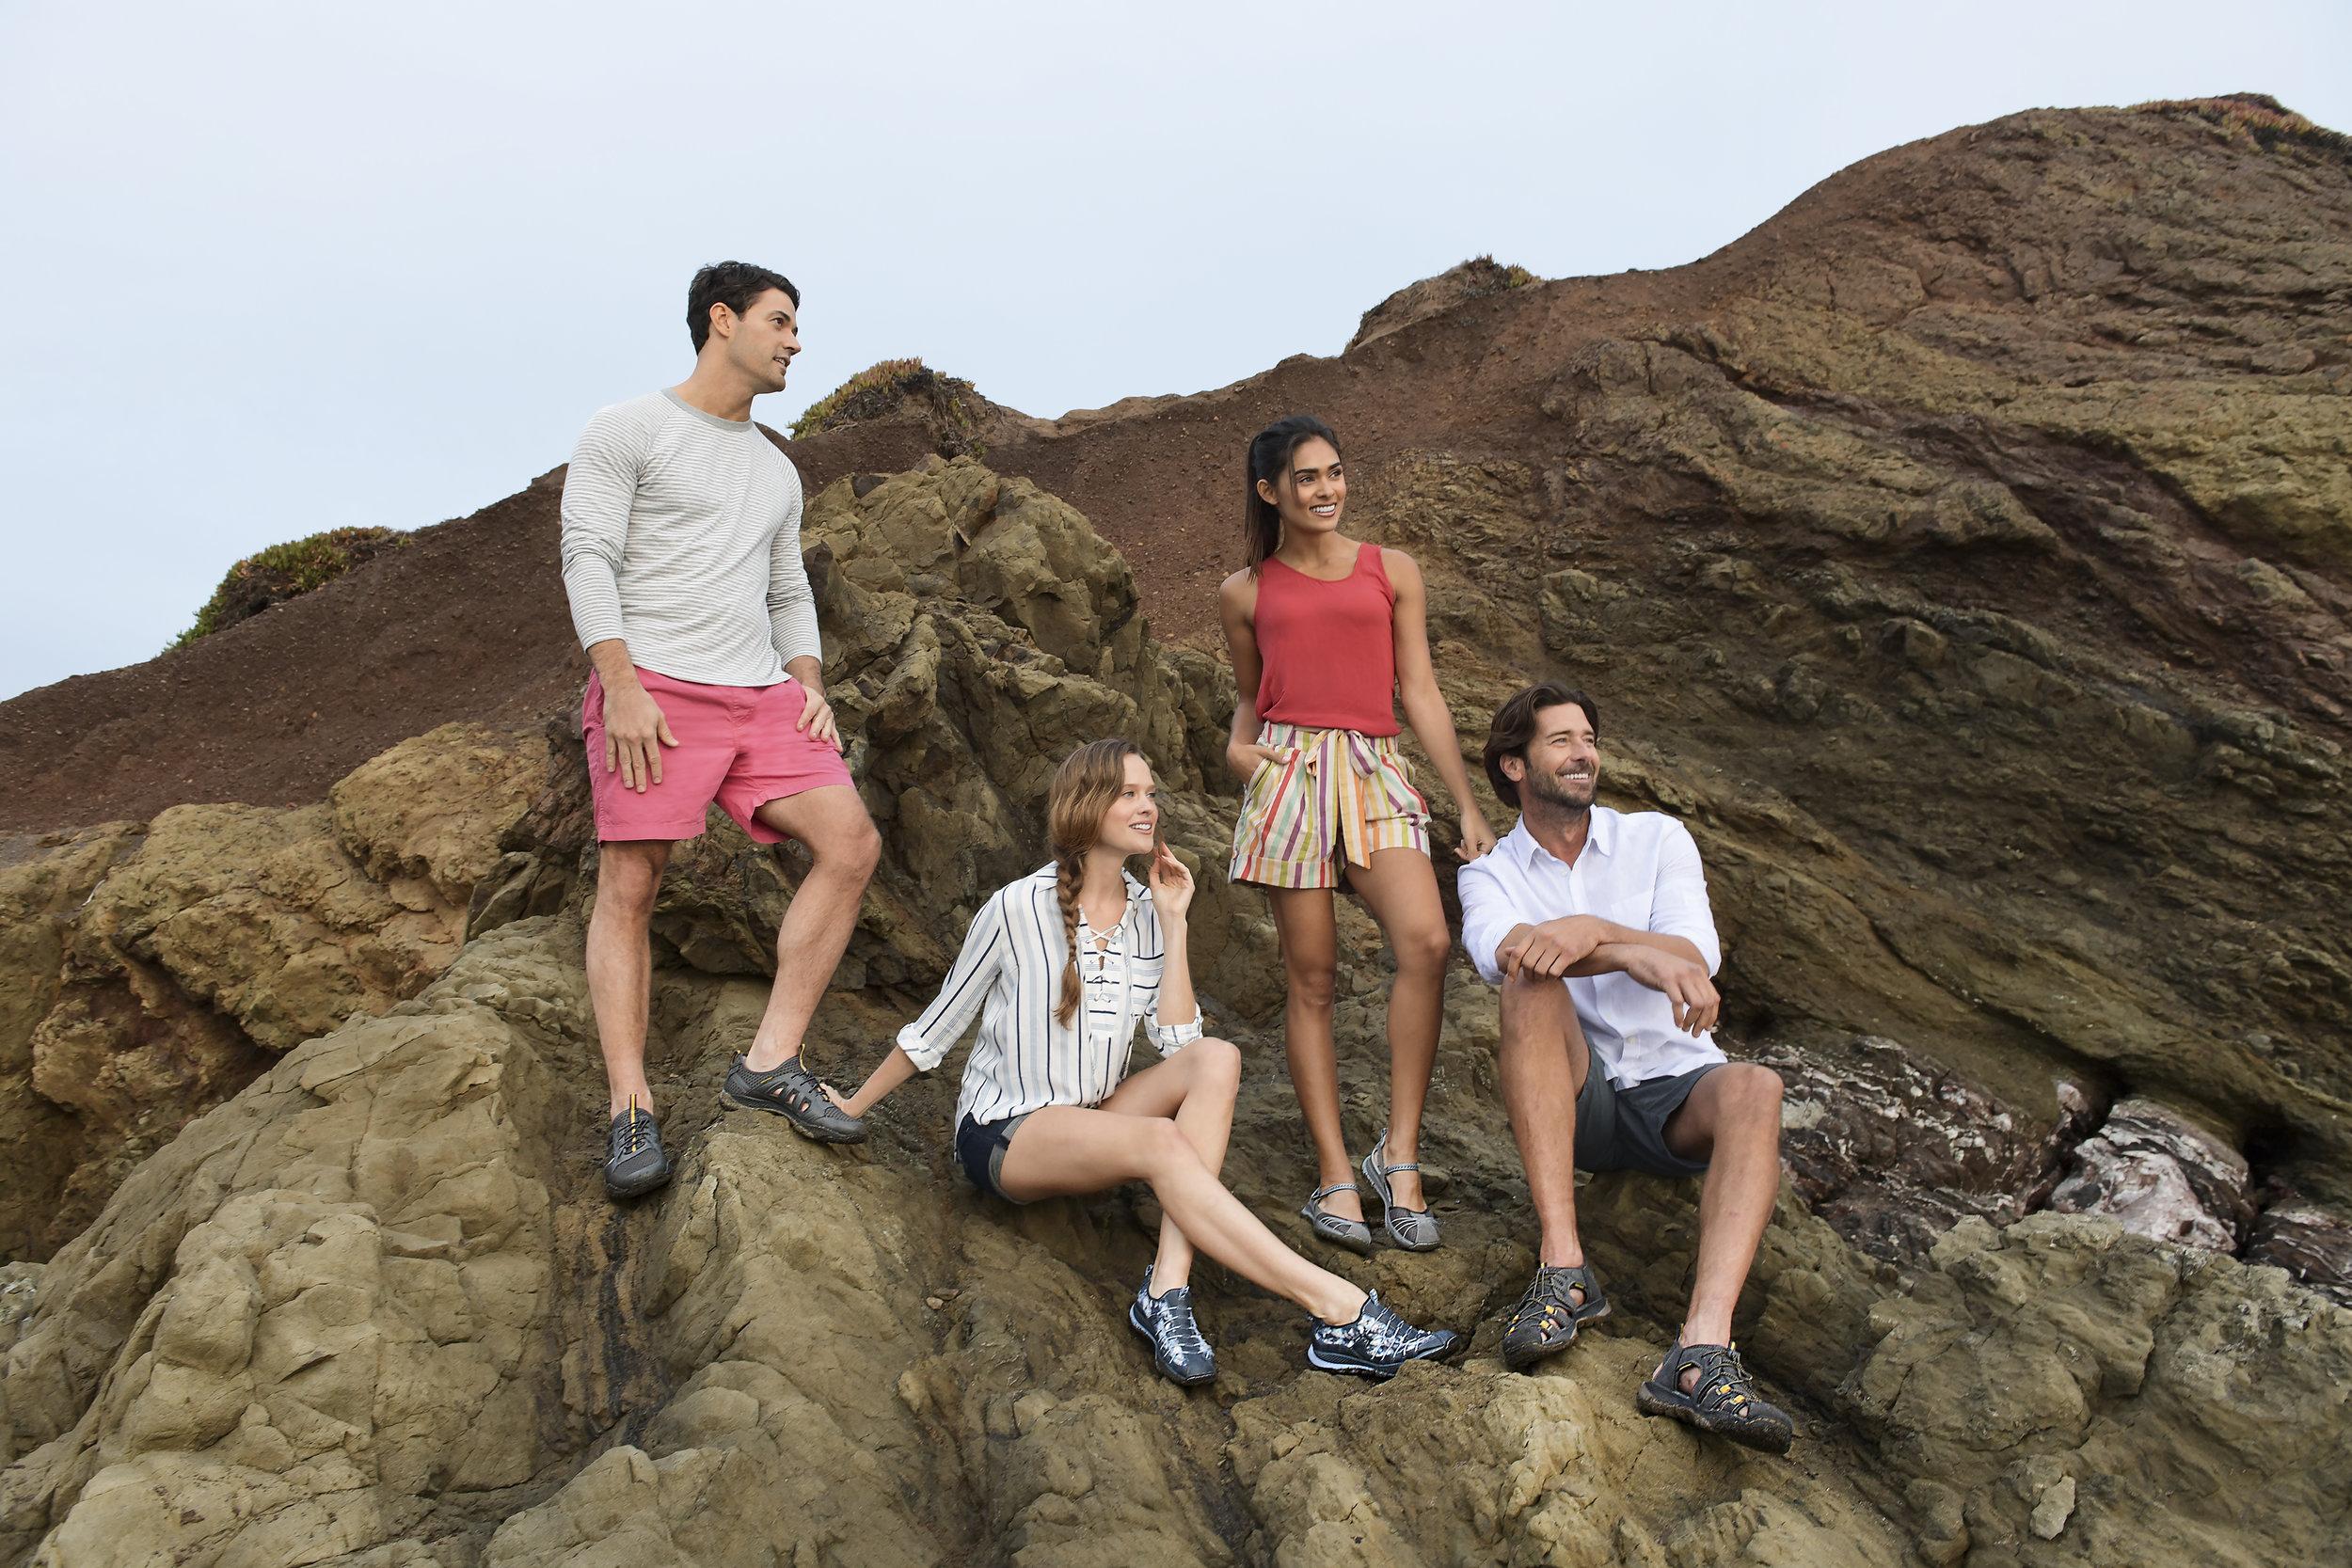 Beach group - Iris, Sparrow, Redwood, BryceBeach groupDSC_5525.jpg